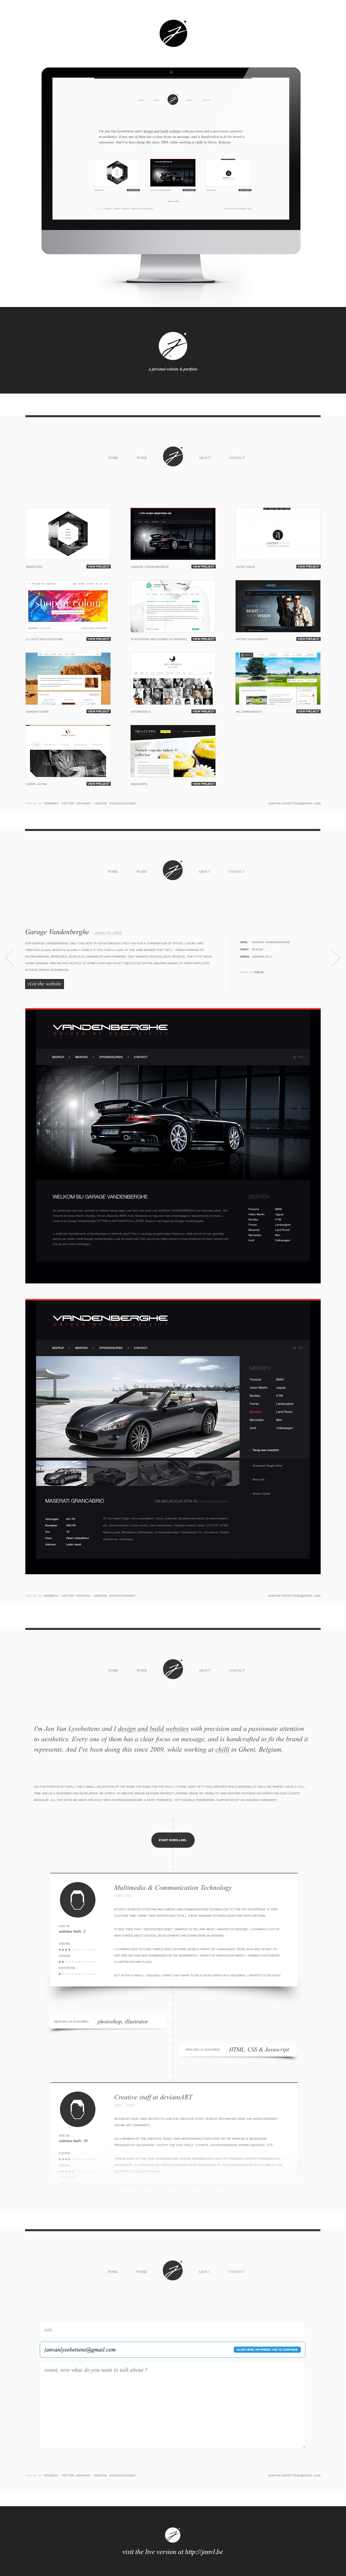 janvl.be: a personal website and portfolio by janvanlysebettens